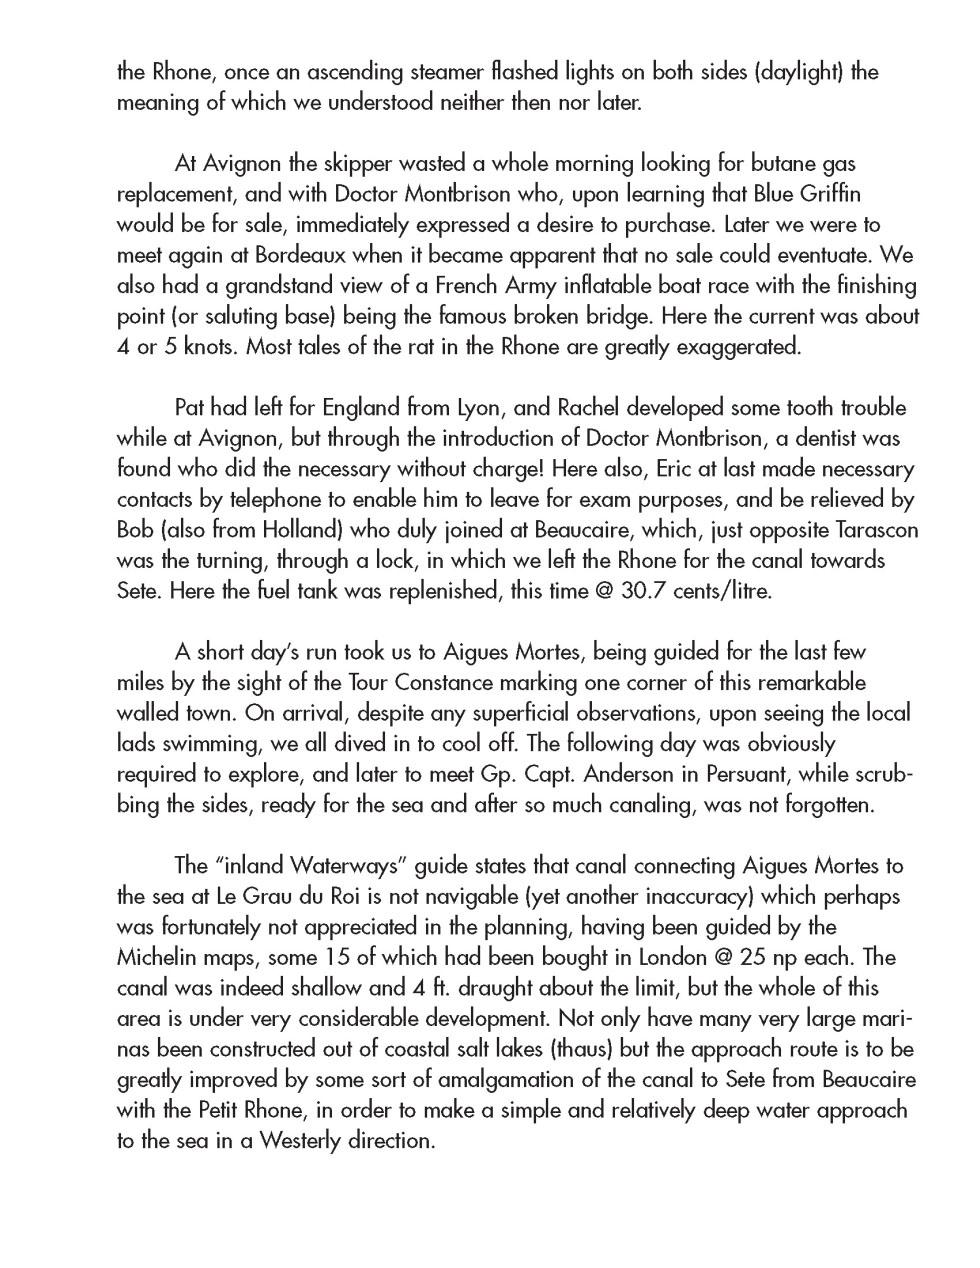 Narrative1971_Page_10